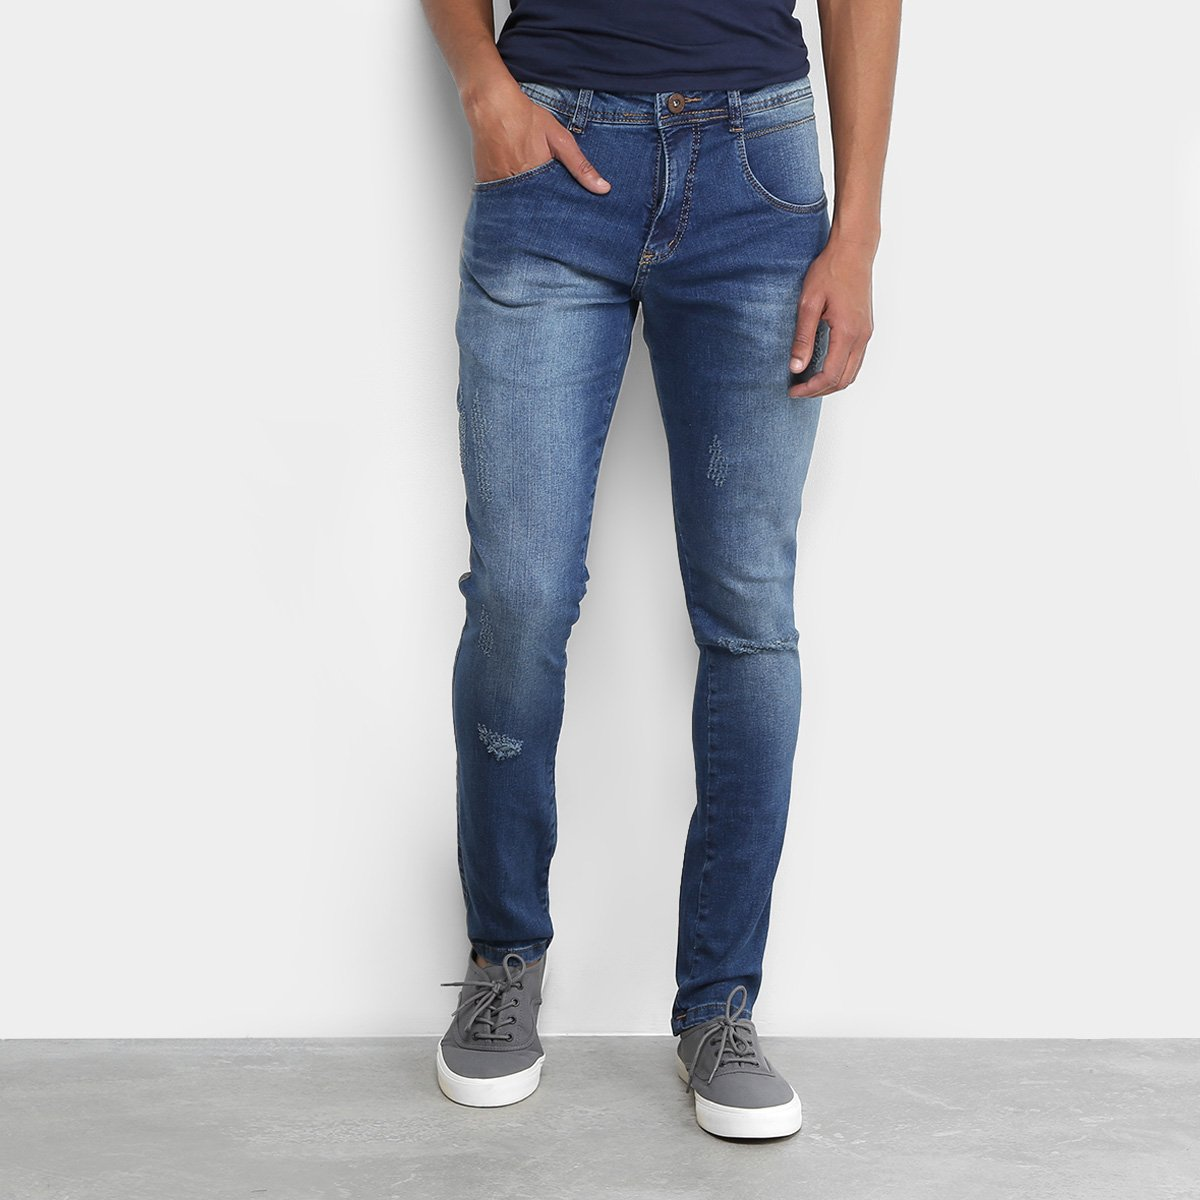 Calça Jeans Skinny Biotipo Estonada Masculina da346917050